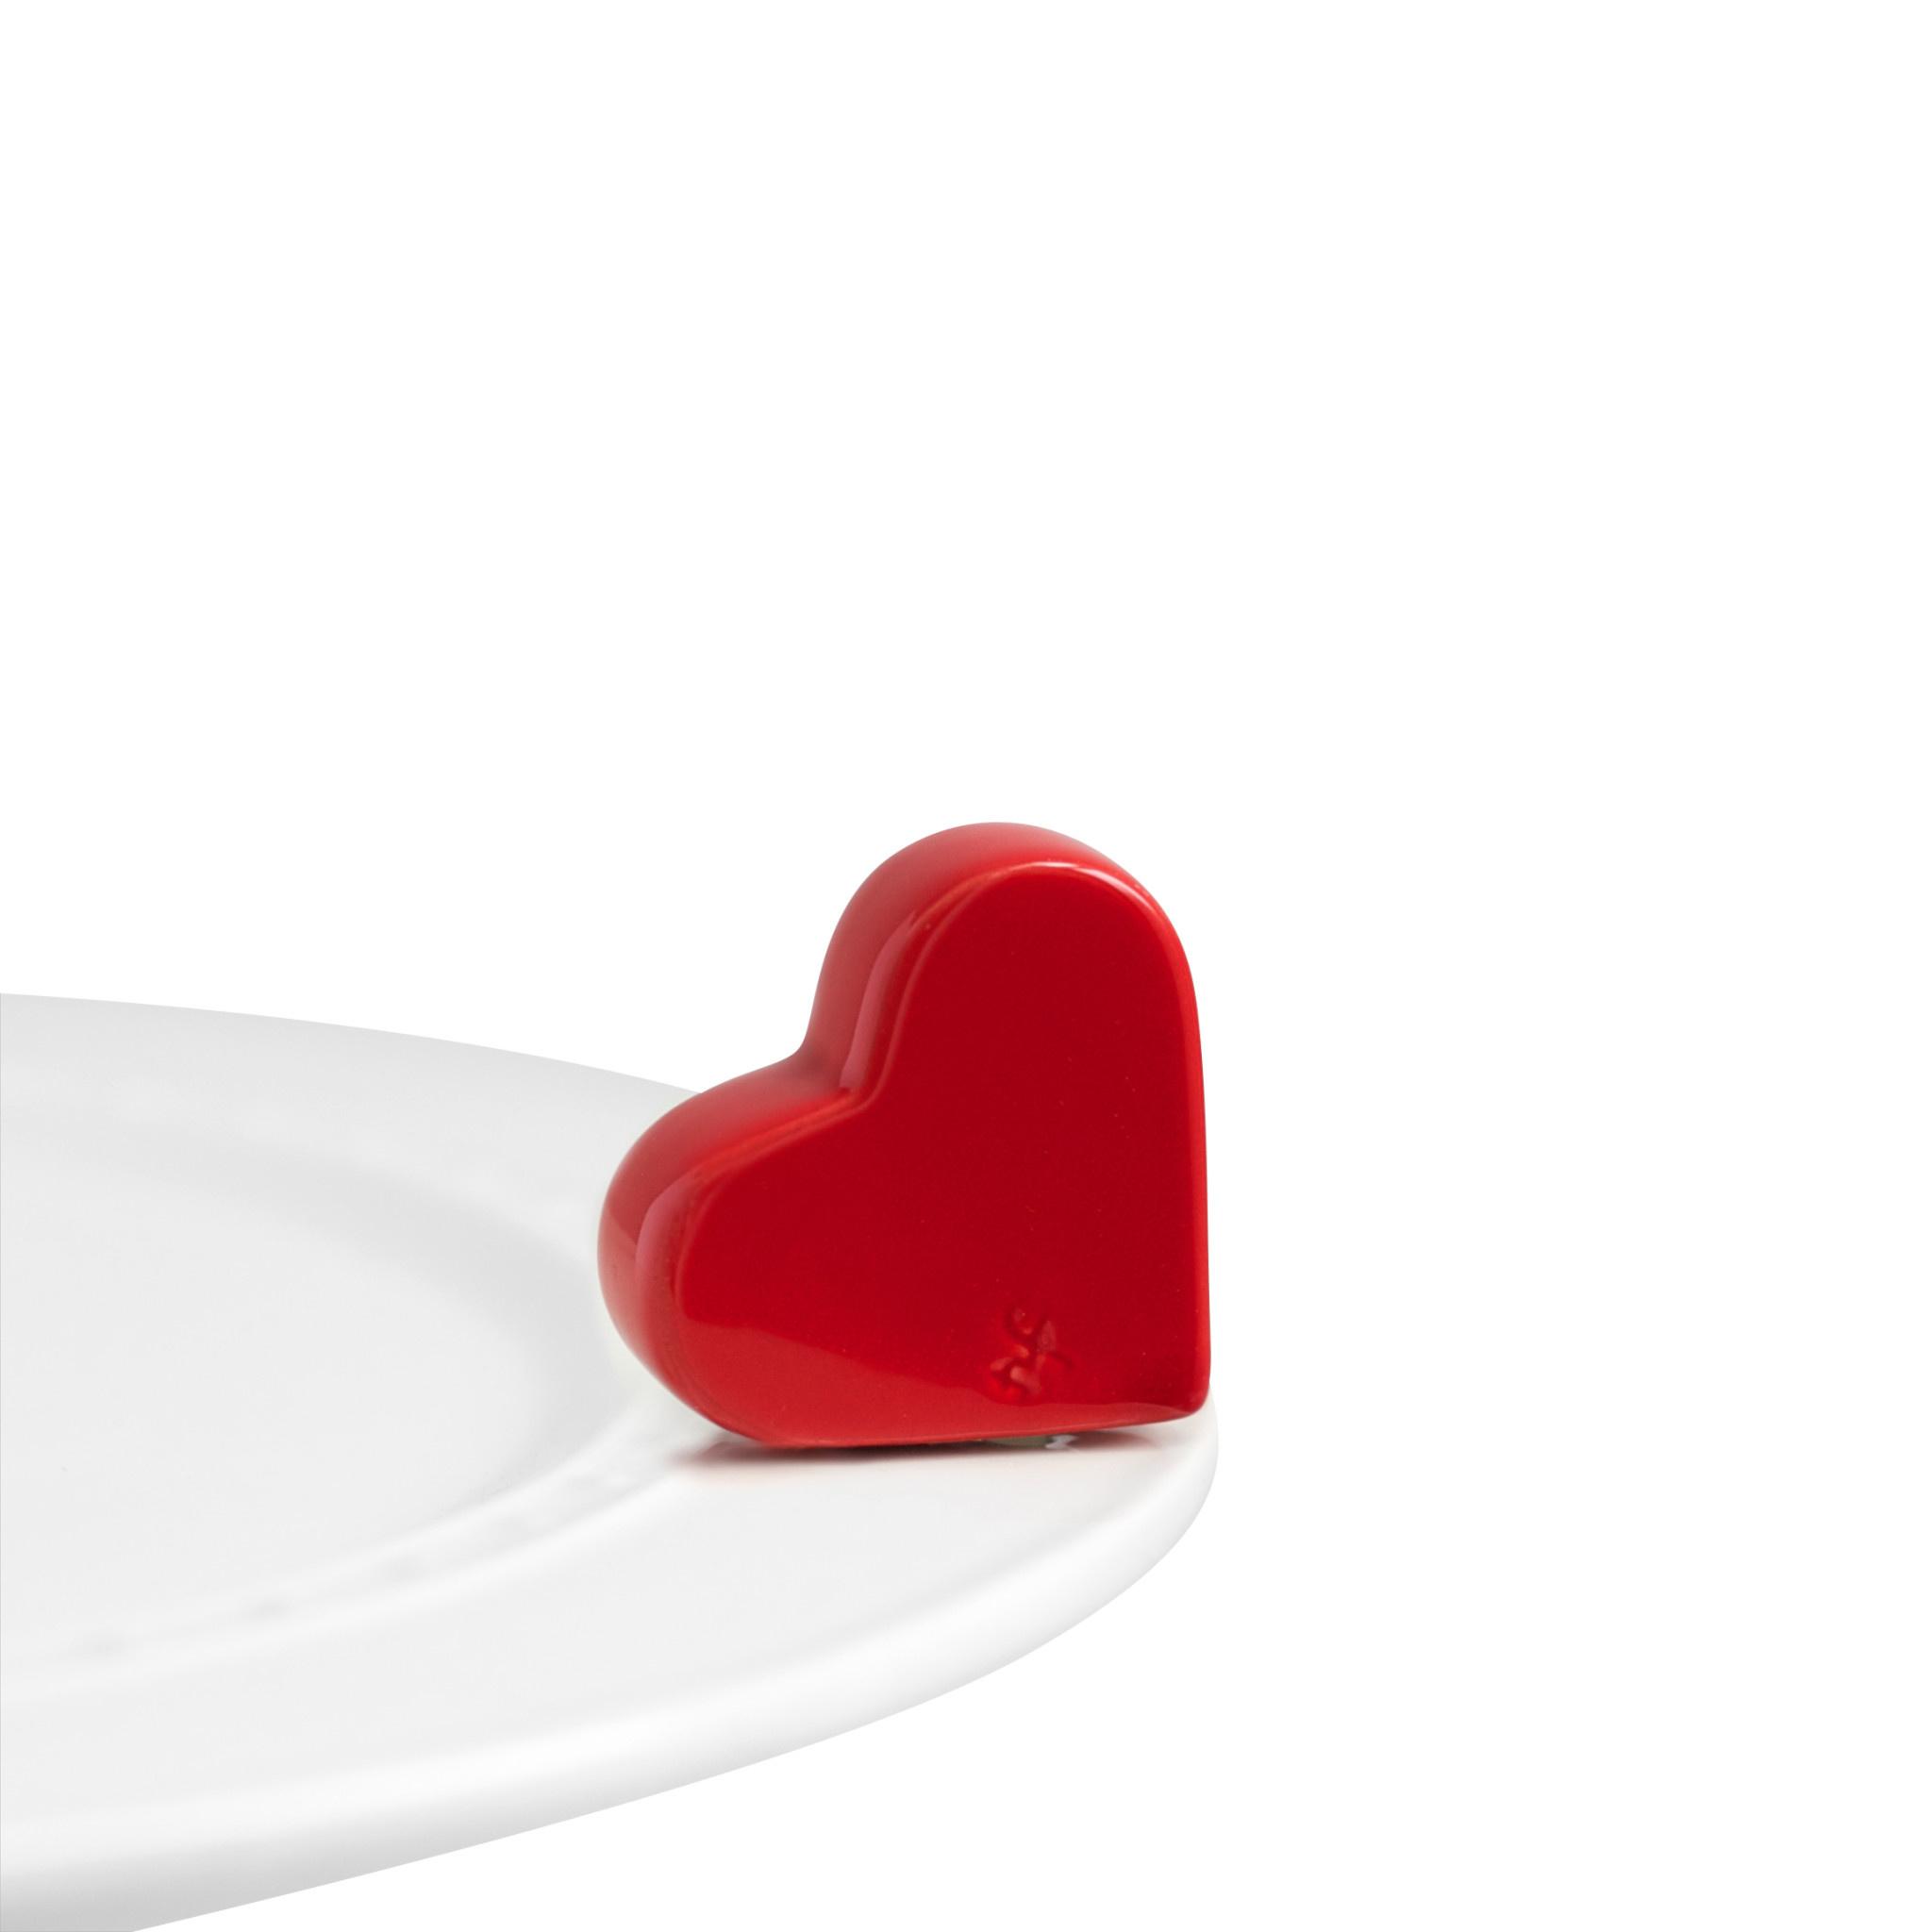 nora fleming be mine mini (red heart)